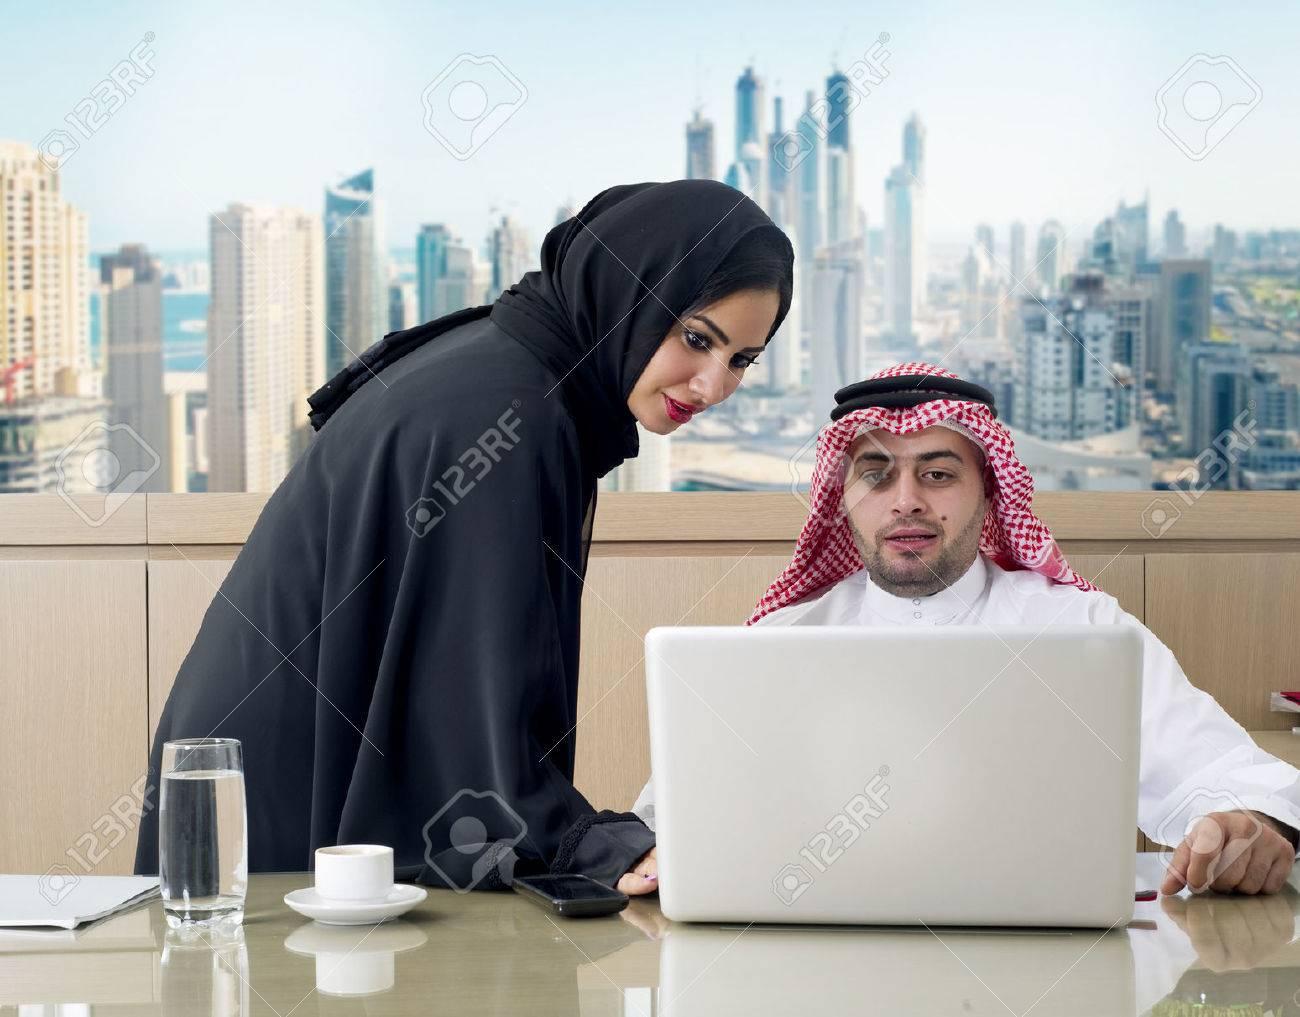 Le bureau en arabe algerie geryville le bureau arabe animation